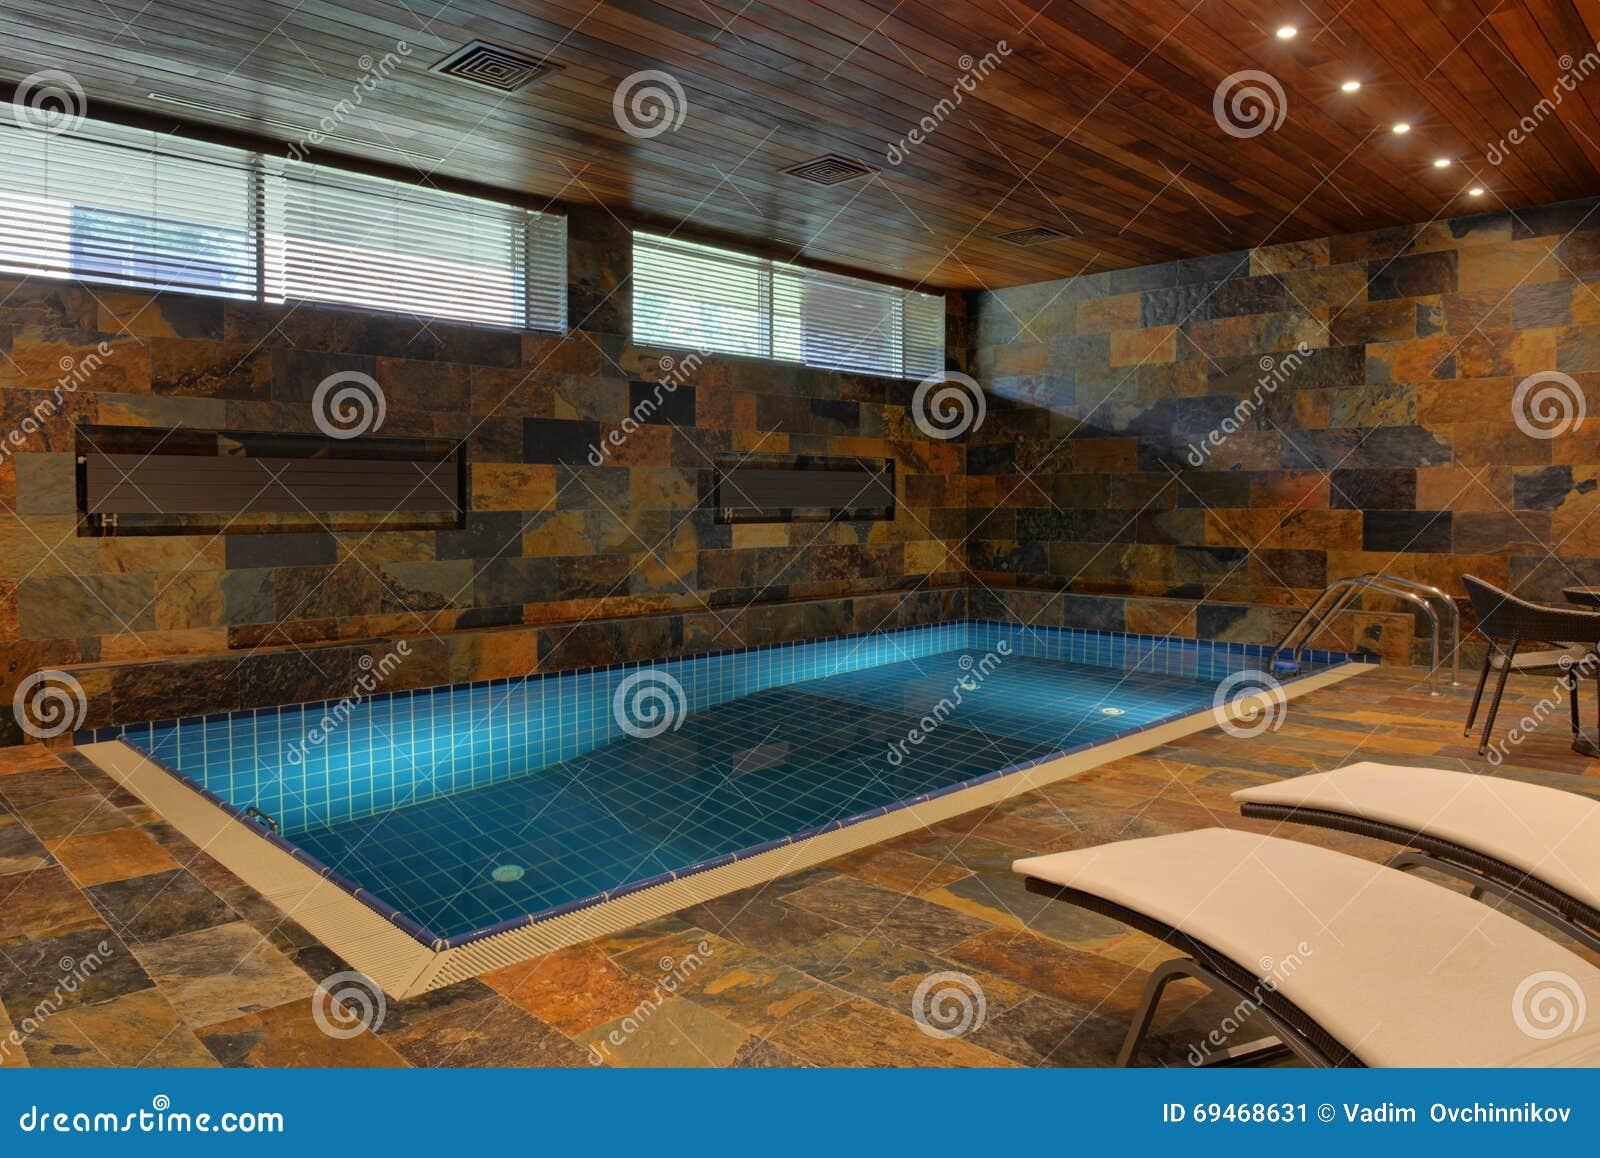 Home Indoor Pool Stock Photo - Image: 69468631